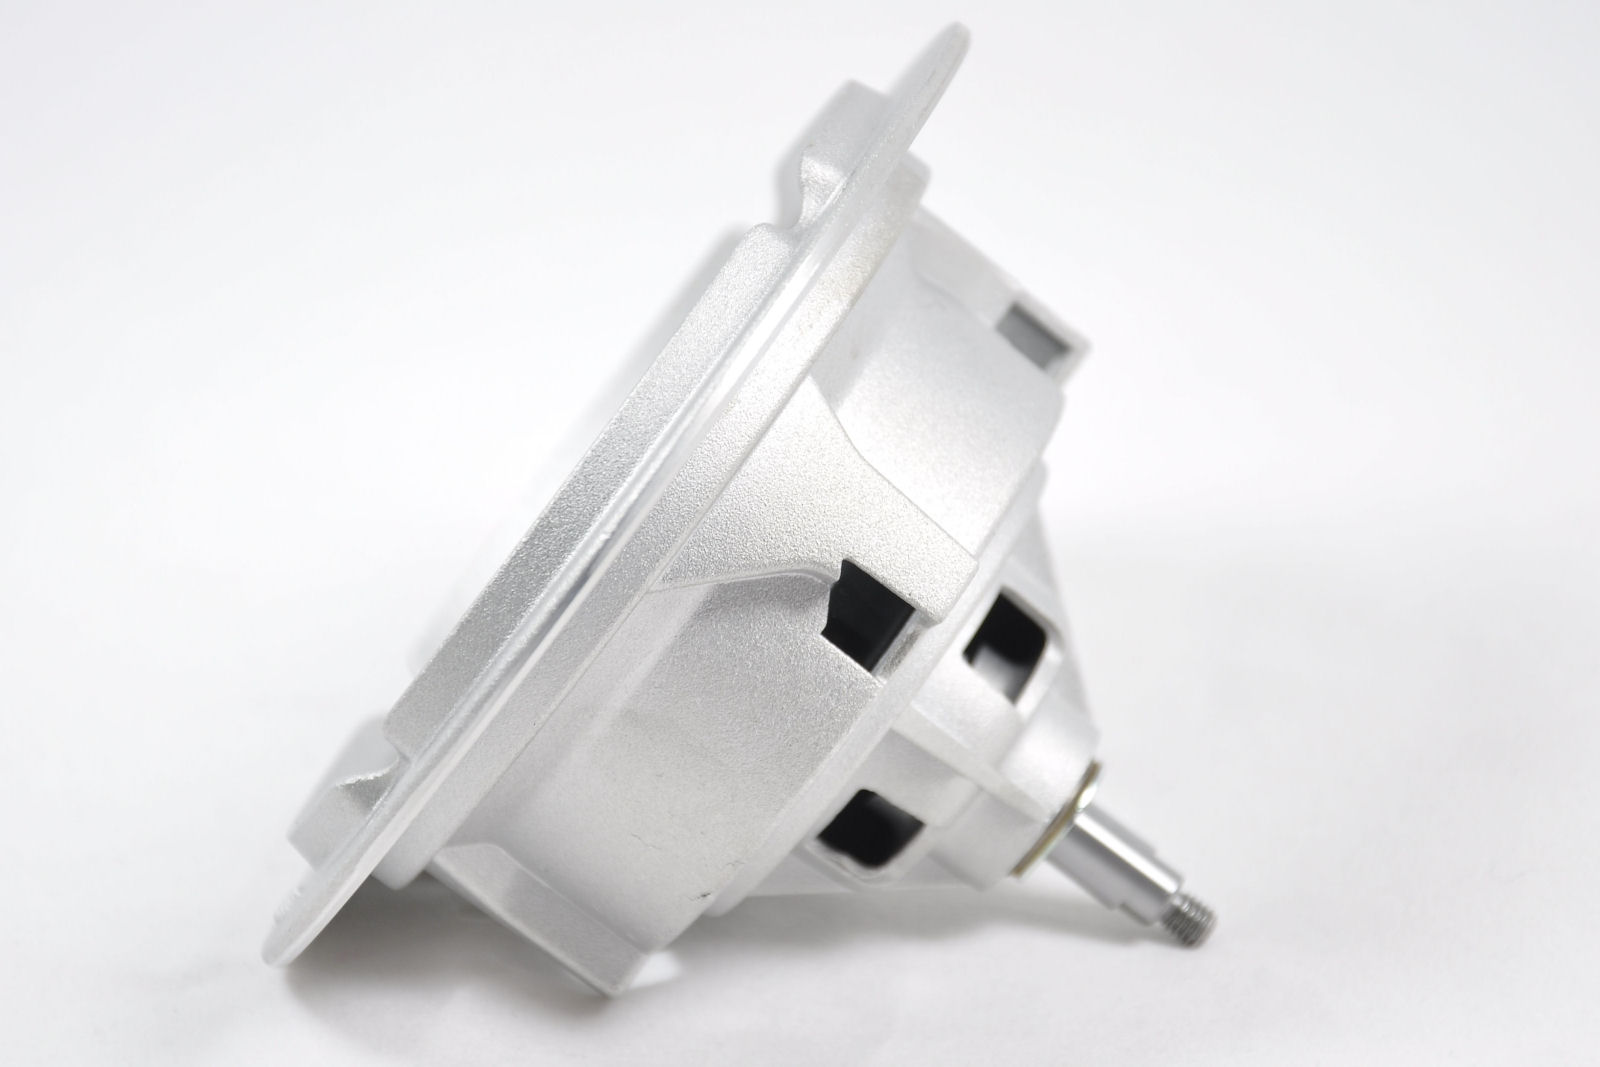 Bodum Vacuum Coffee Maker Replacement Parts Bodum 12 Cup Replacement